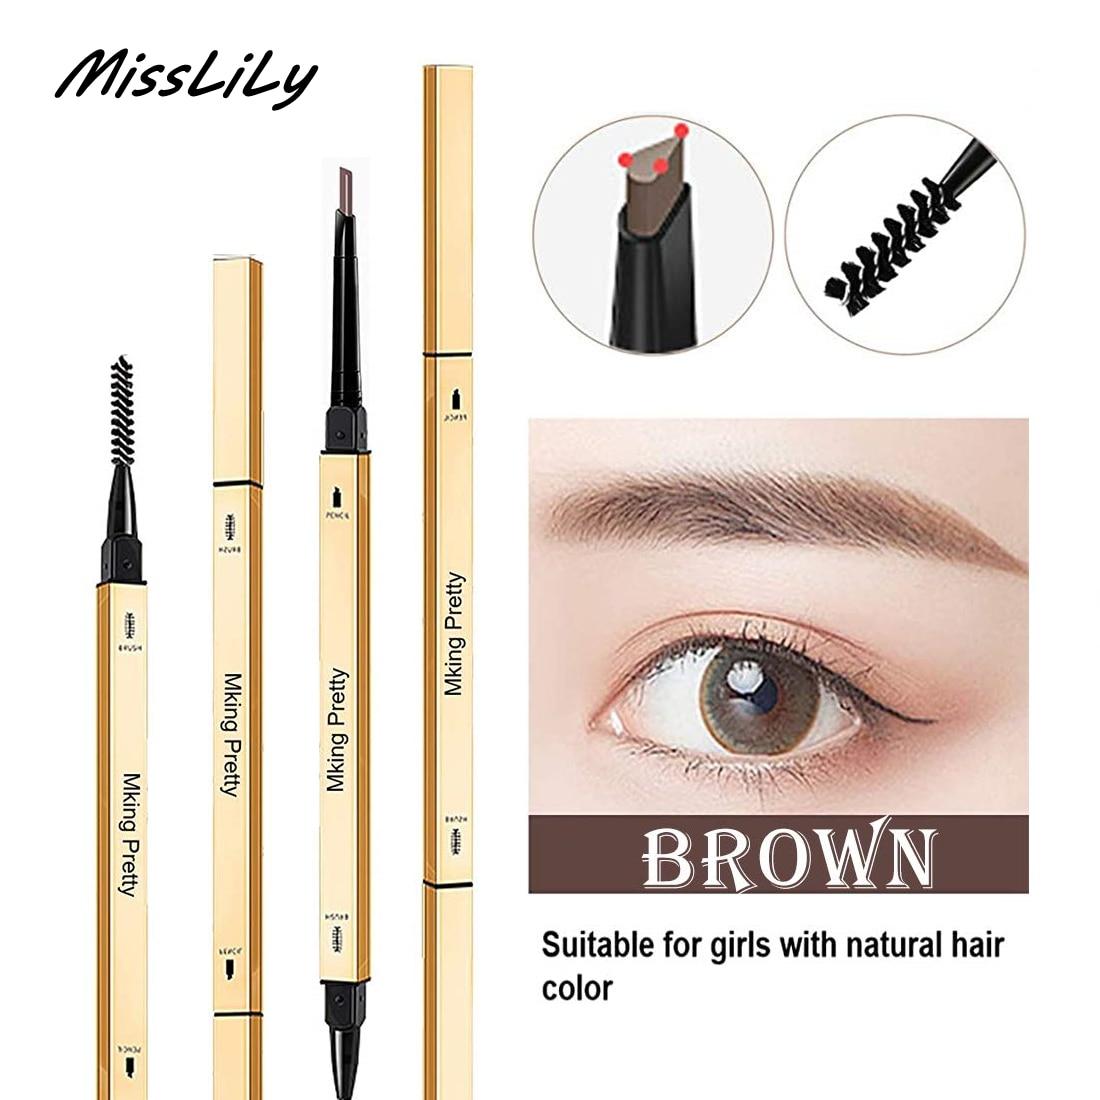 Double Head Eyebrow Pencil Long Lasting Waterproof 5 Colors Ultra Fine Triangle Eye Brow Pen Tint Mascara Enhance Cosmetics